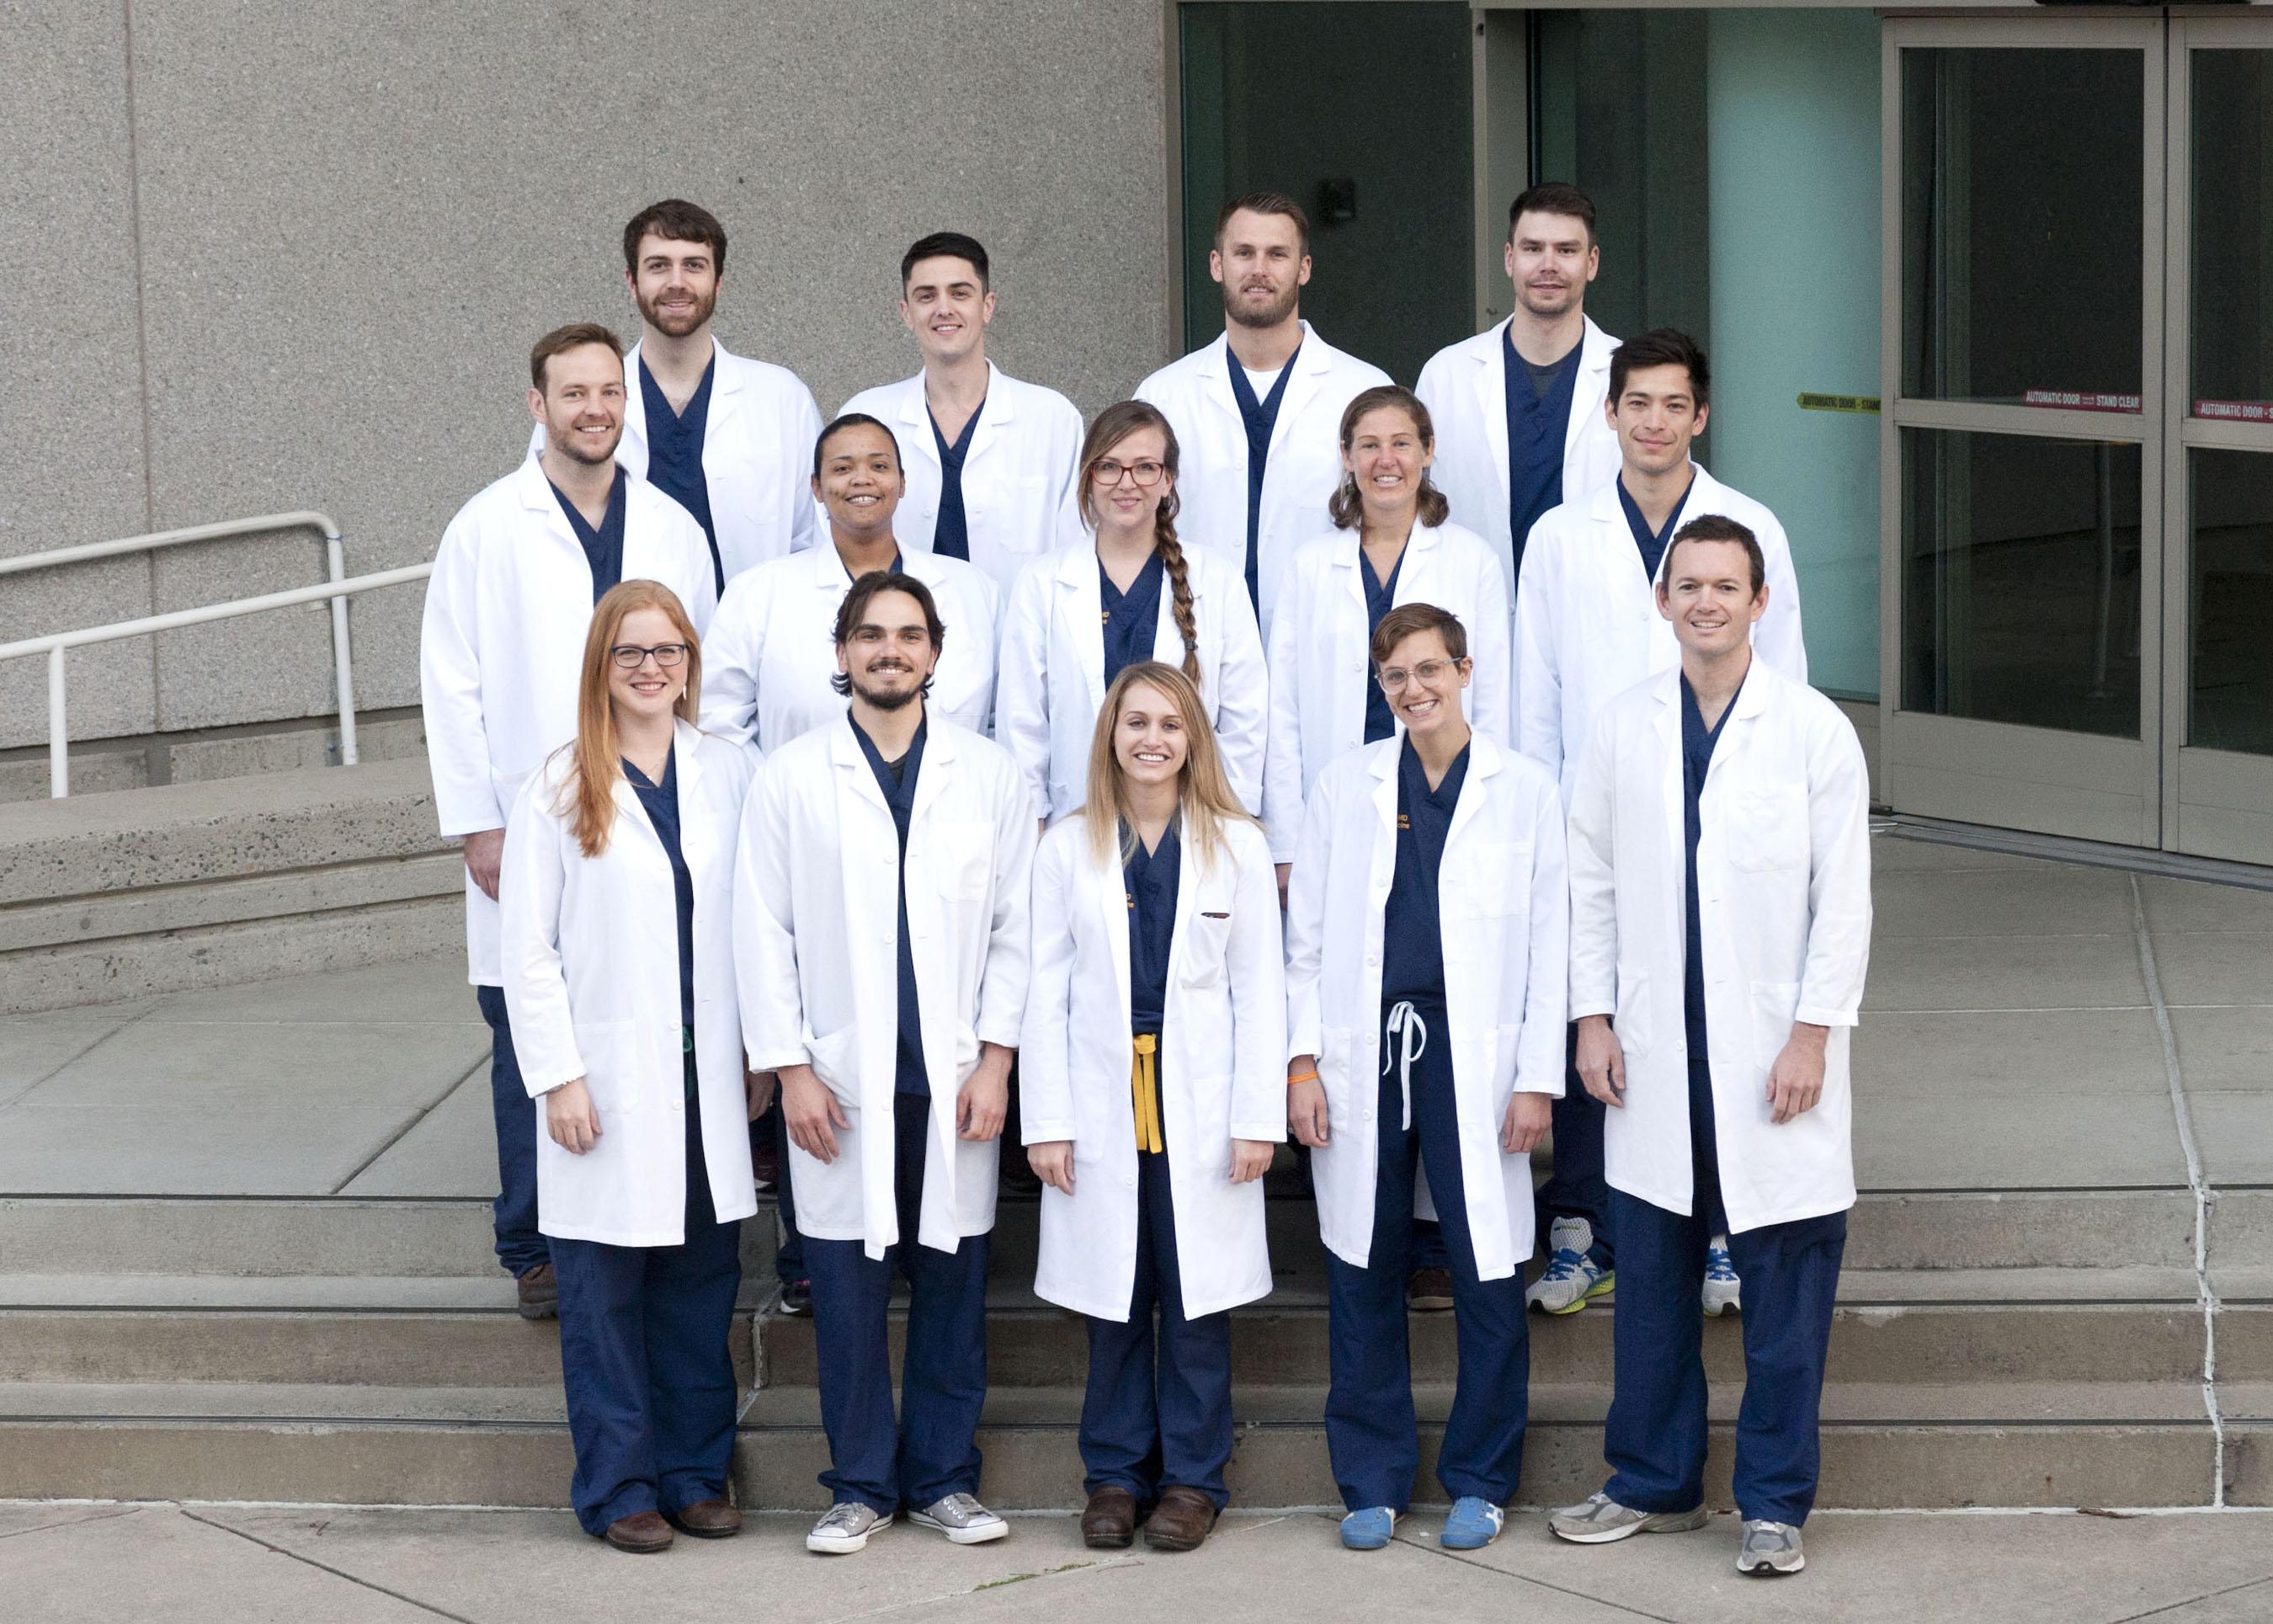 Uc Davis Emergency Medicine Education Residency